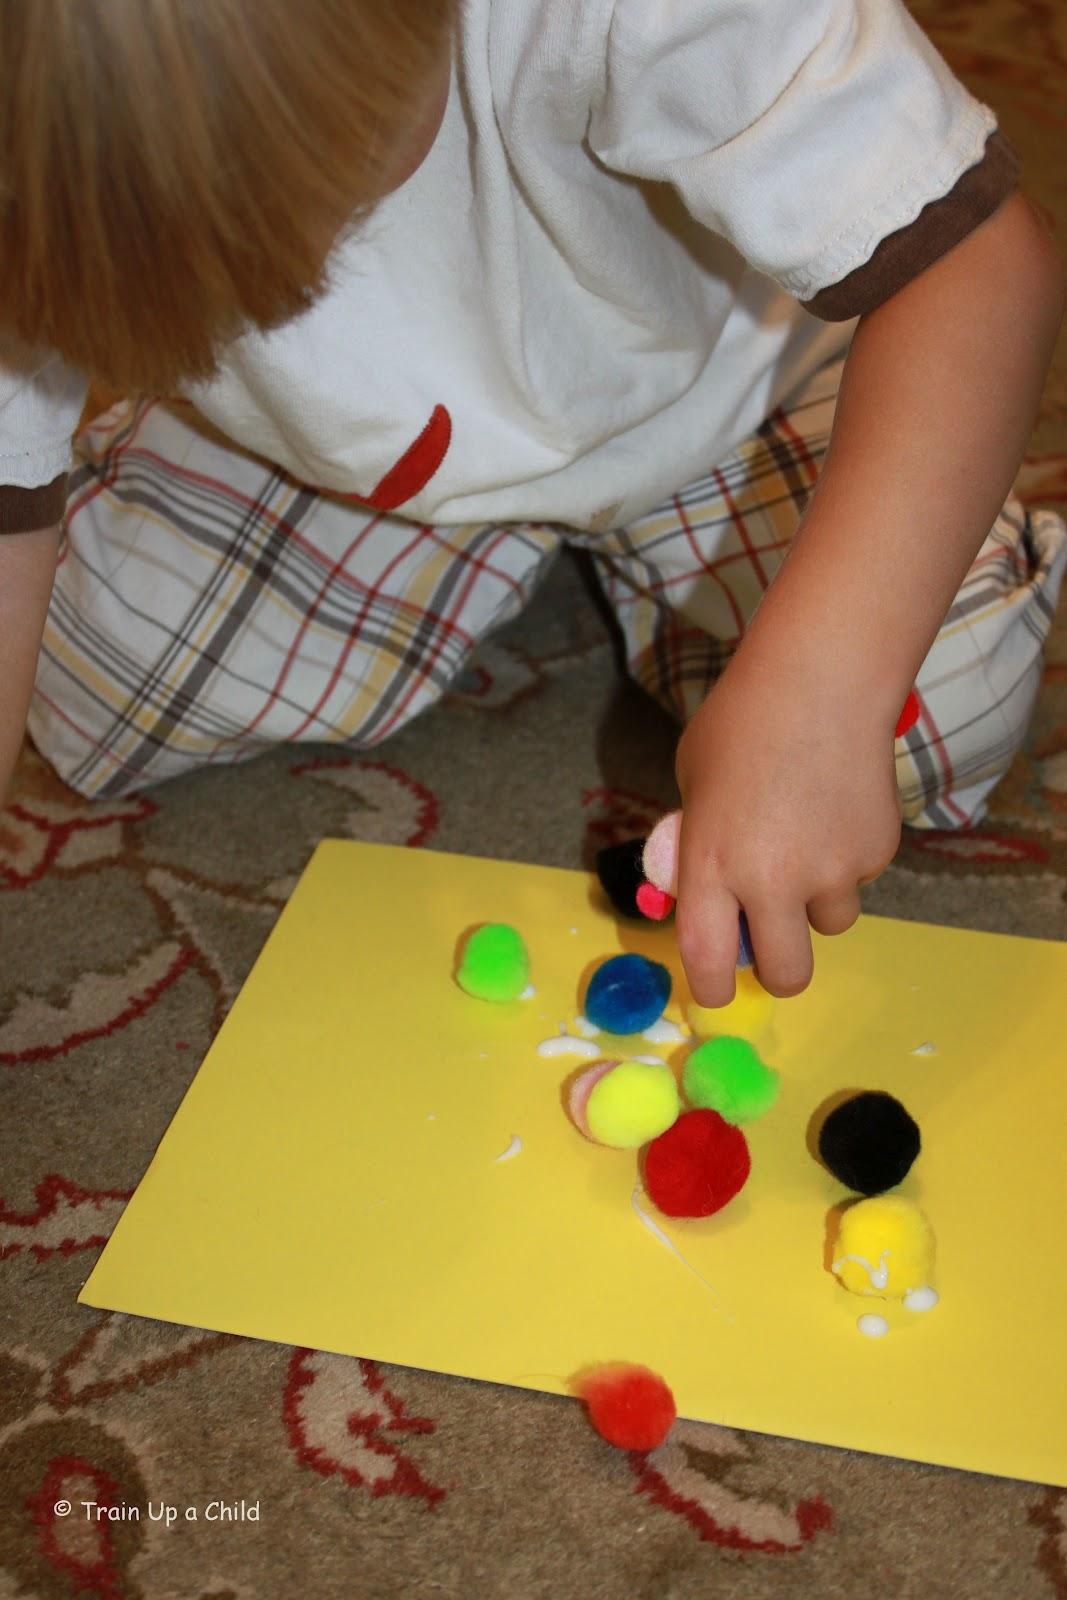 https://2.bp.blogspot.com/-sxjdUhuu3Jw/UEaEC2vHLVI/AAAAAAAAKX8/4yYvlq_d4vk/s1600/Apple+crafts+and+learning+unit+for+preschool+(9).jpg